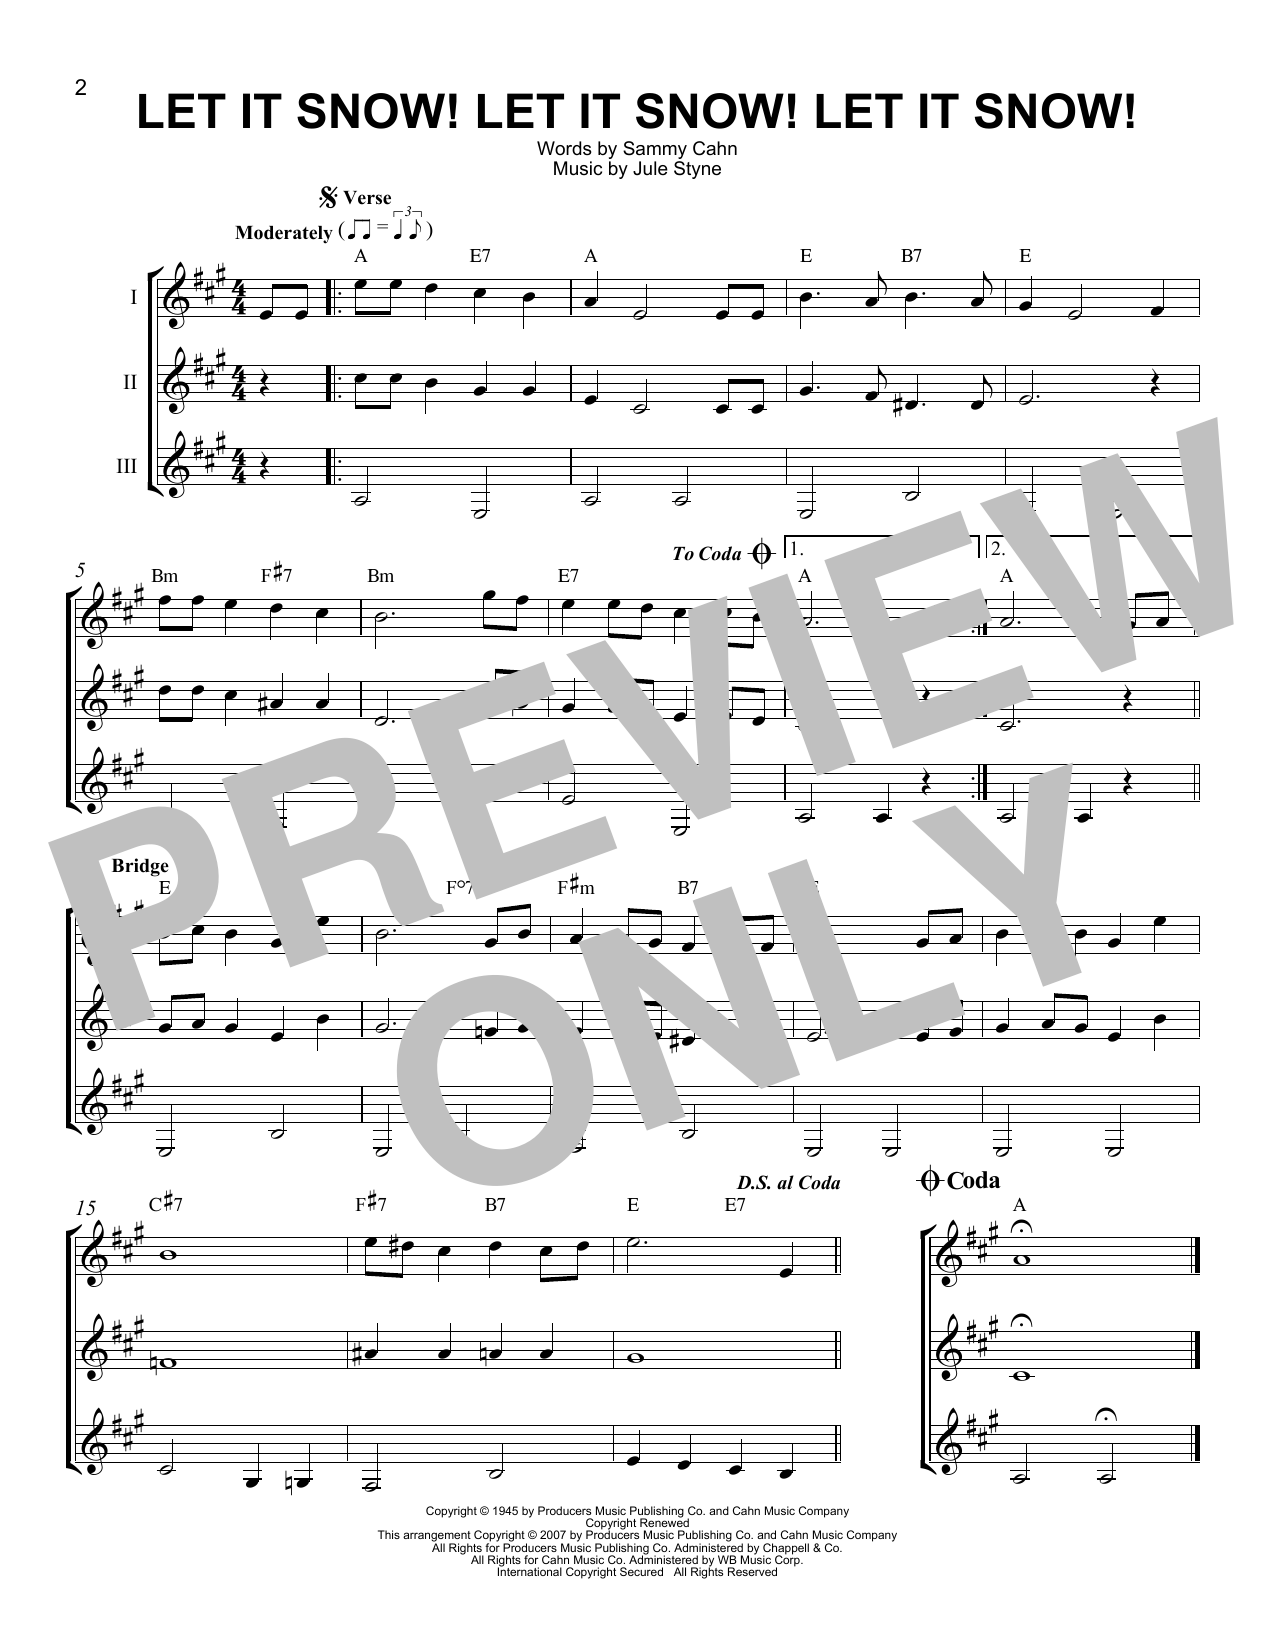 Let It Snow! Let It Snow! Let It Snow! (Guitar Ensemble)